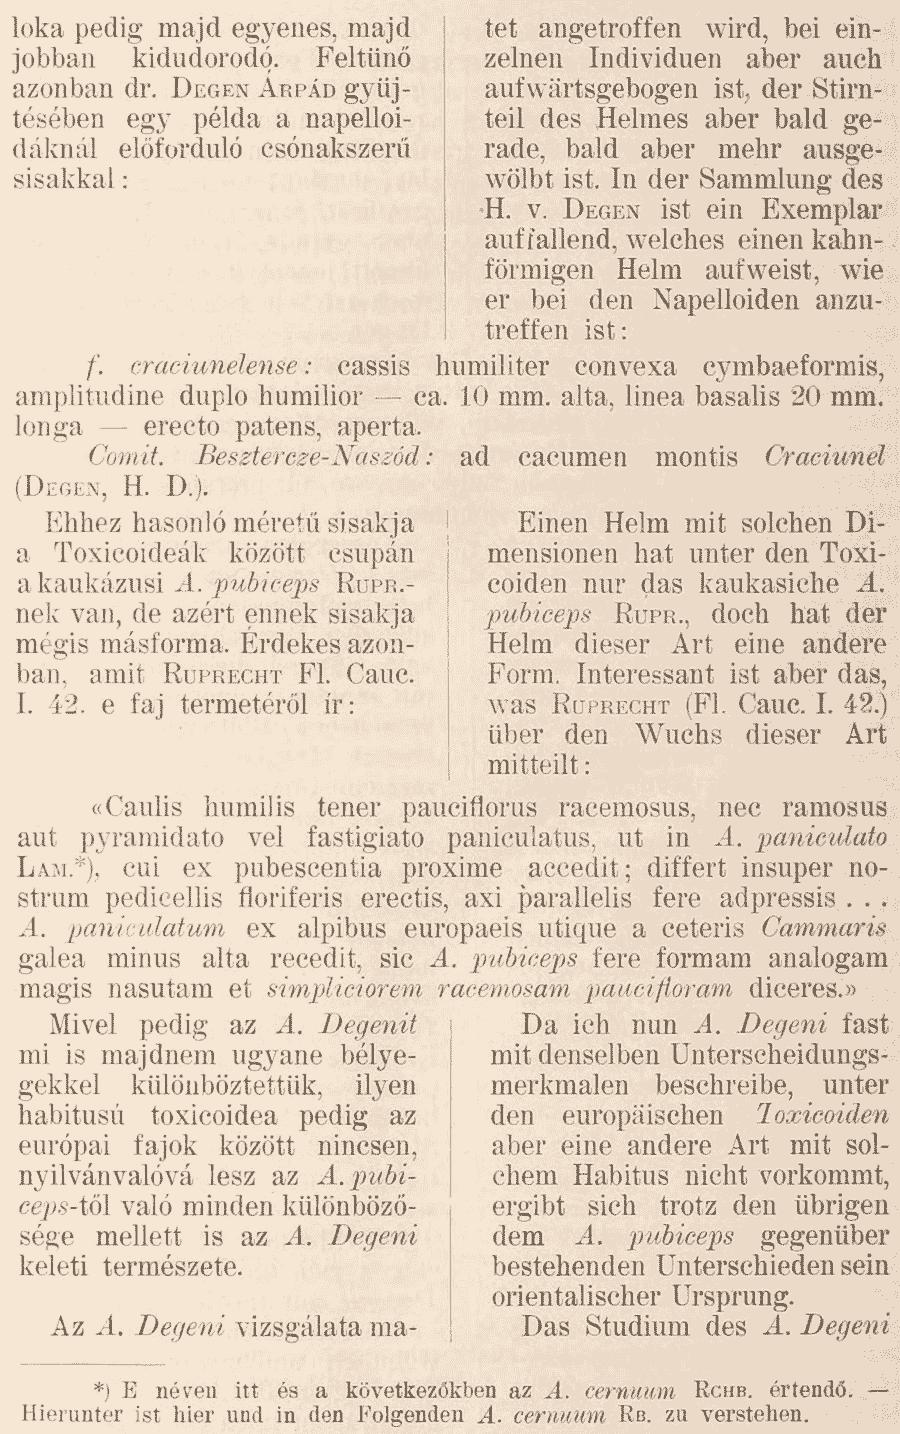 http://forum.plantarium.ru/misc.php?action=pun_attachment&item=17901